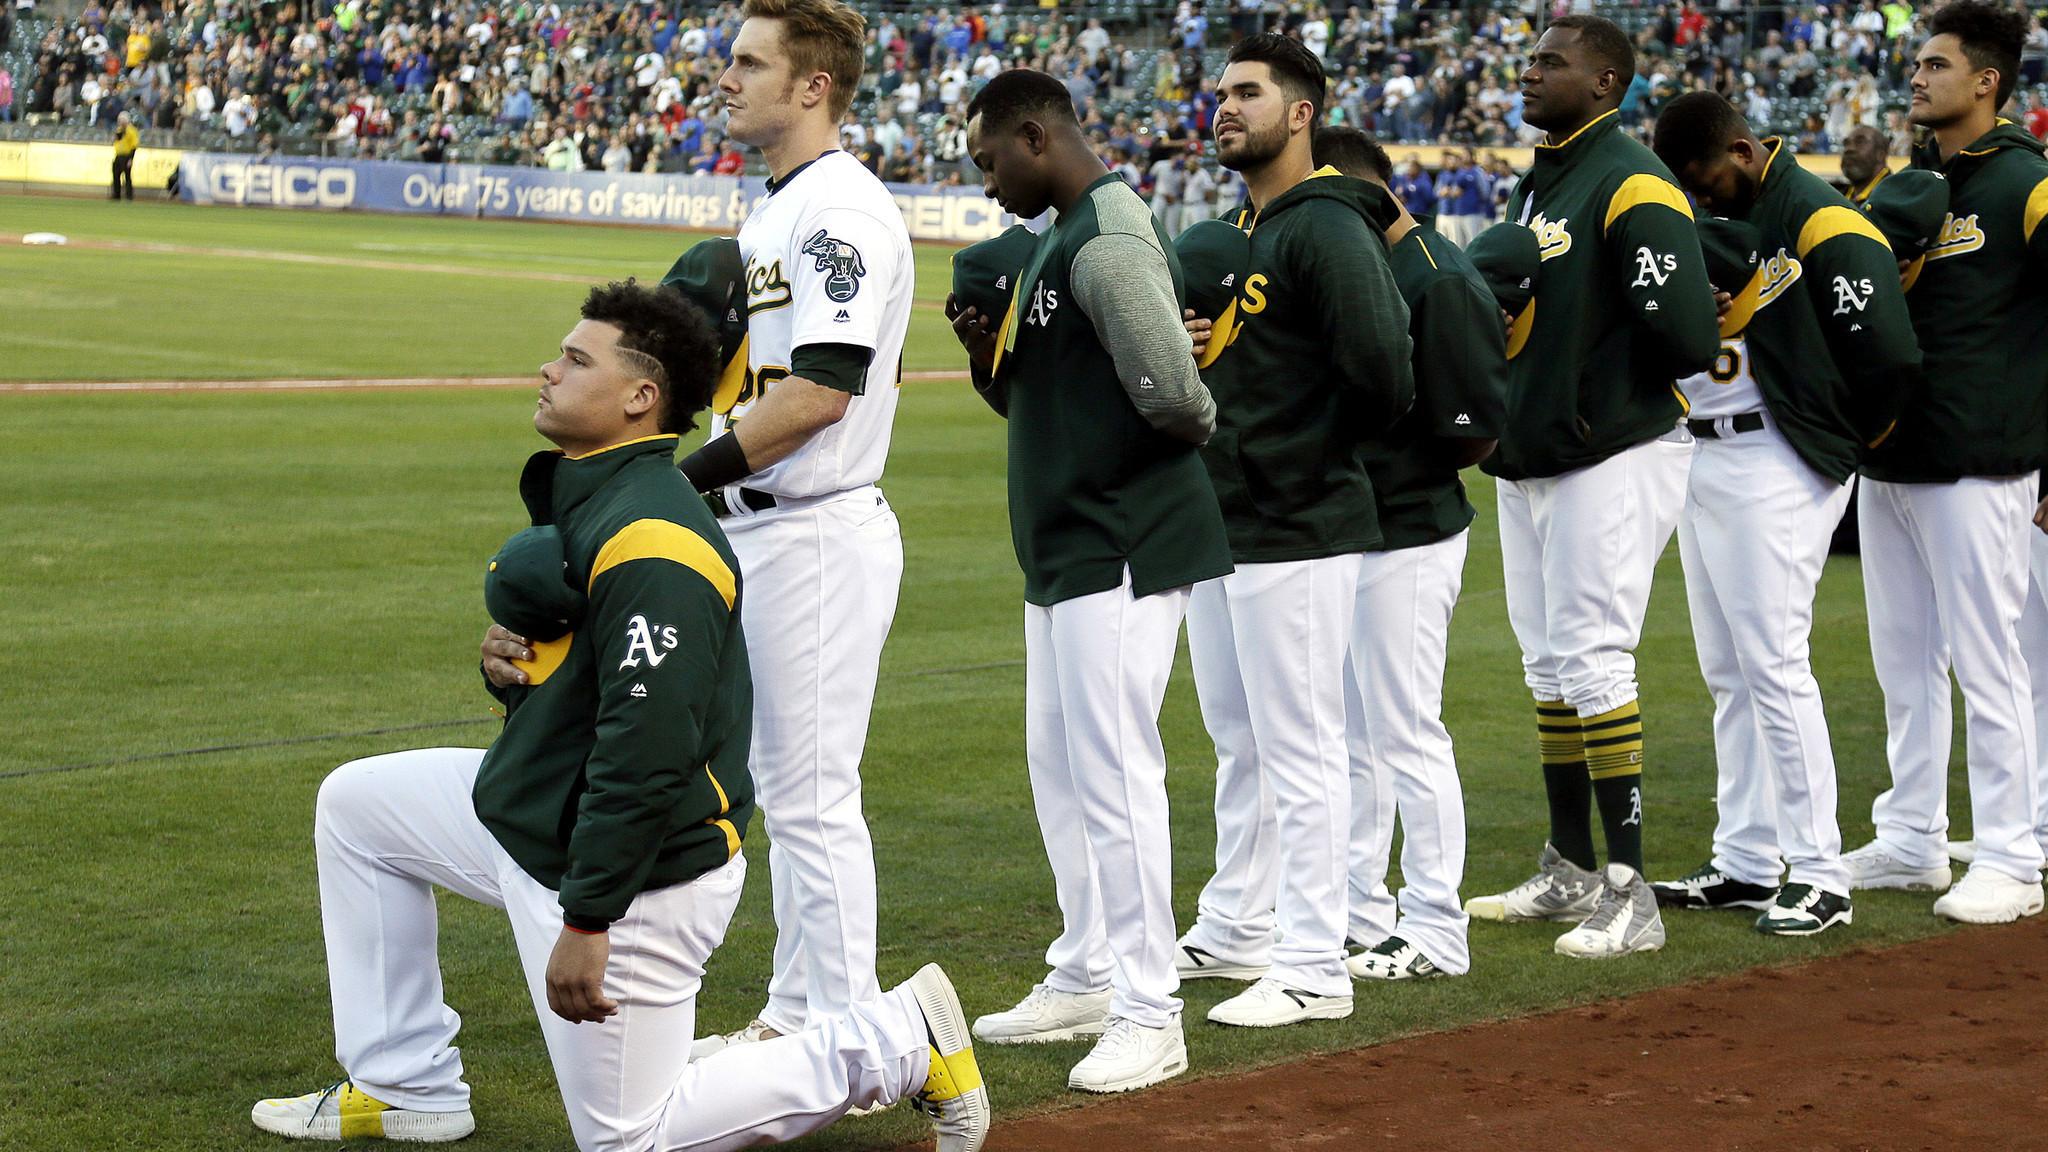 La-sp-baseball-notes-20170923